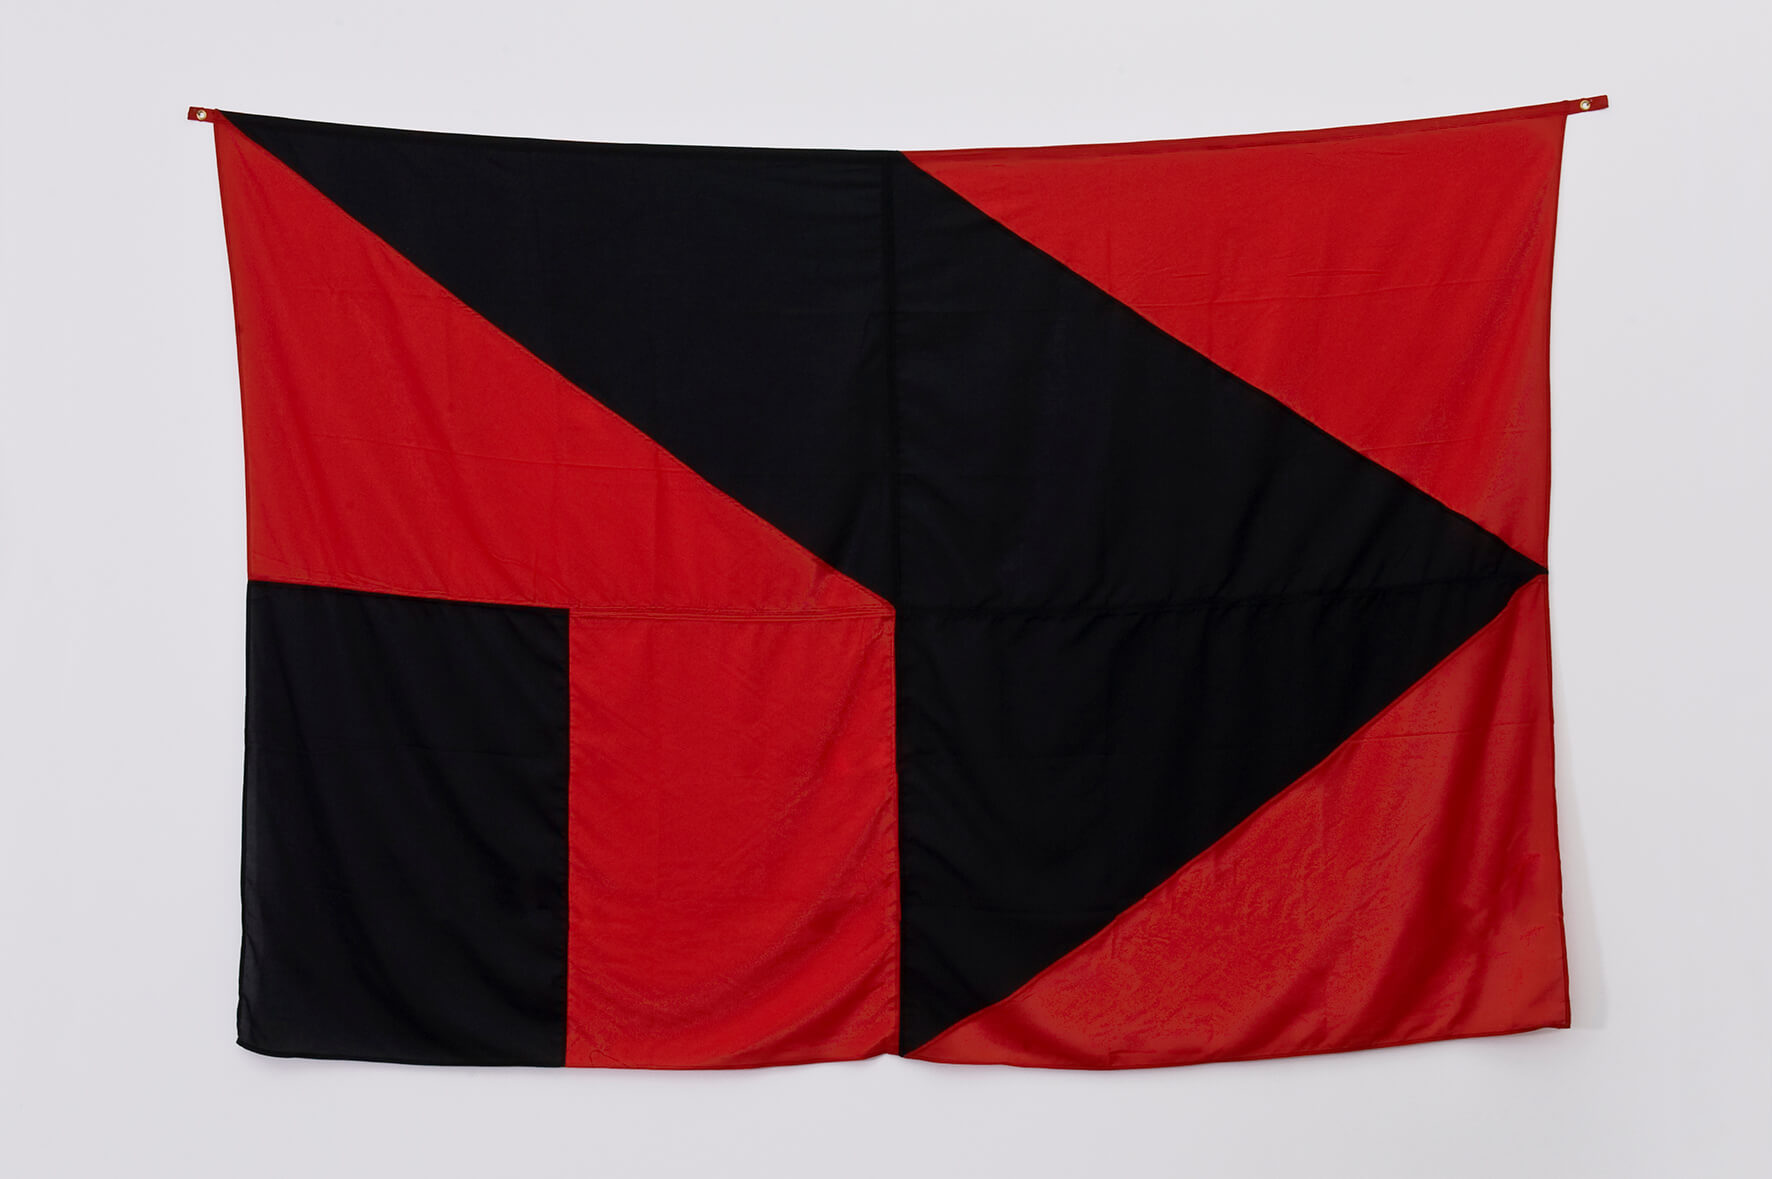 Not all that moves is red (Tangram) #2, 2012 | Asier Mendizabal | ProjecteSD